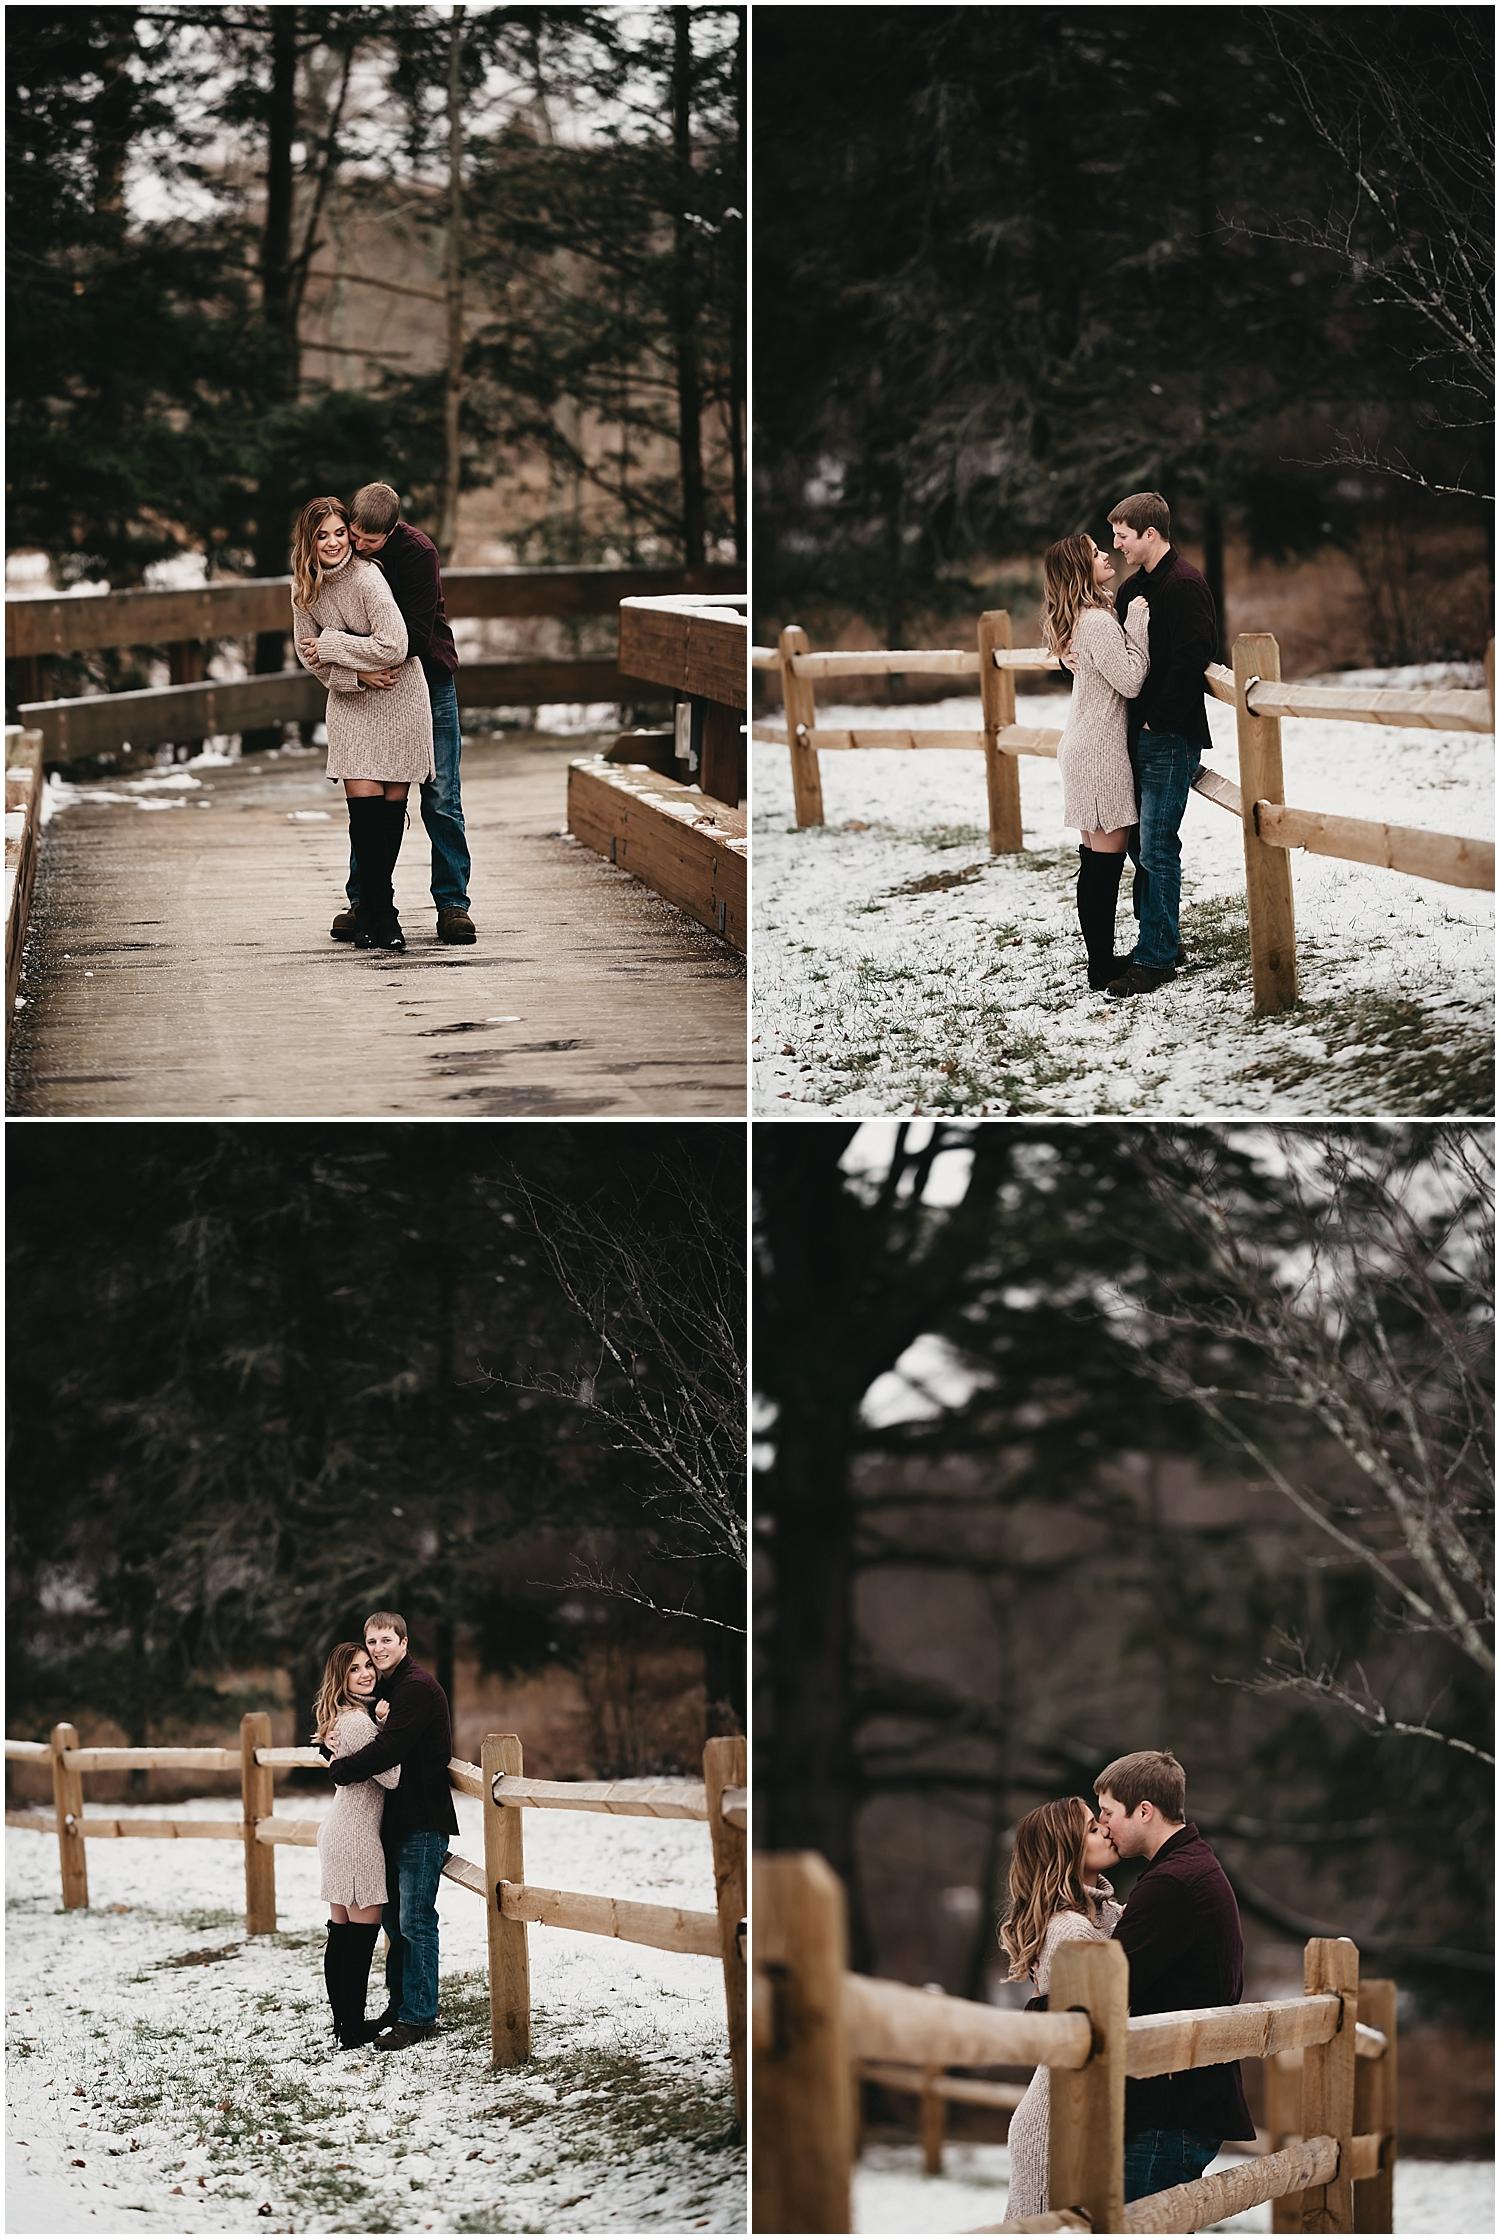 NEPA-Scranton-wedding-engagement-photographer-in-Lock-Haven-PA-Central-PA_0144.jpg